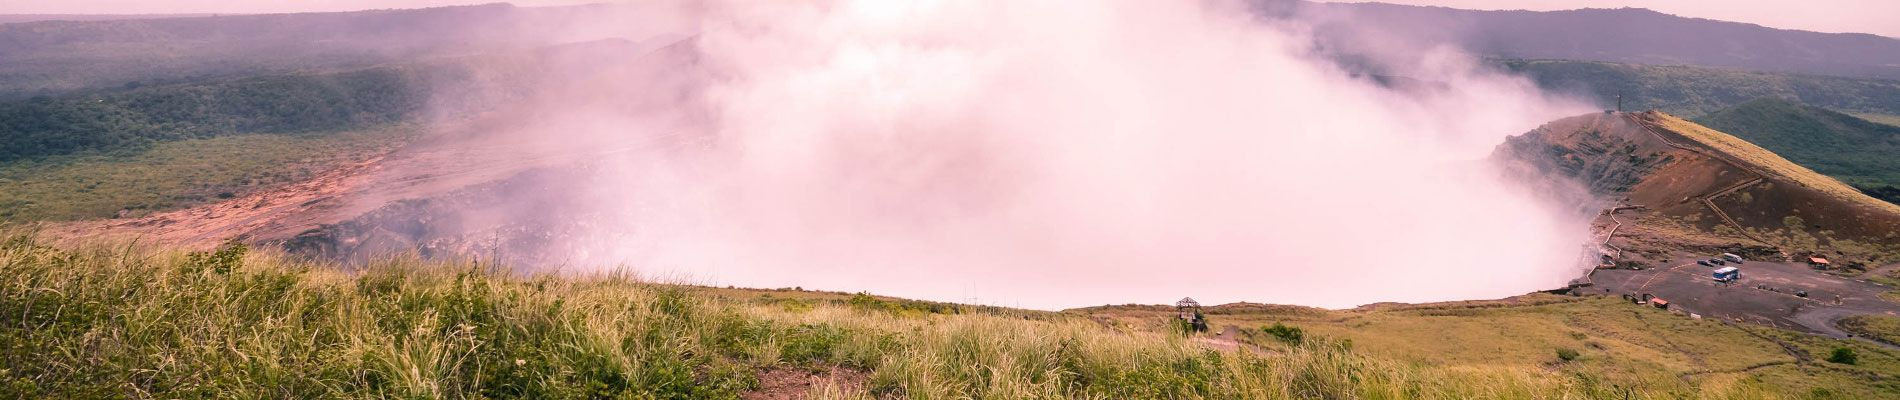 nicaragua-volcan-masaya-nindiri